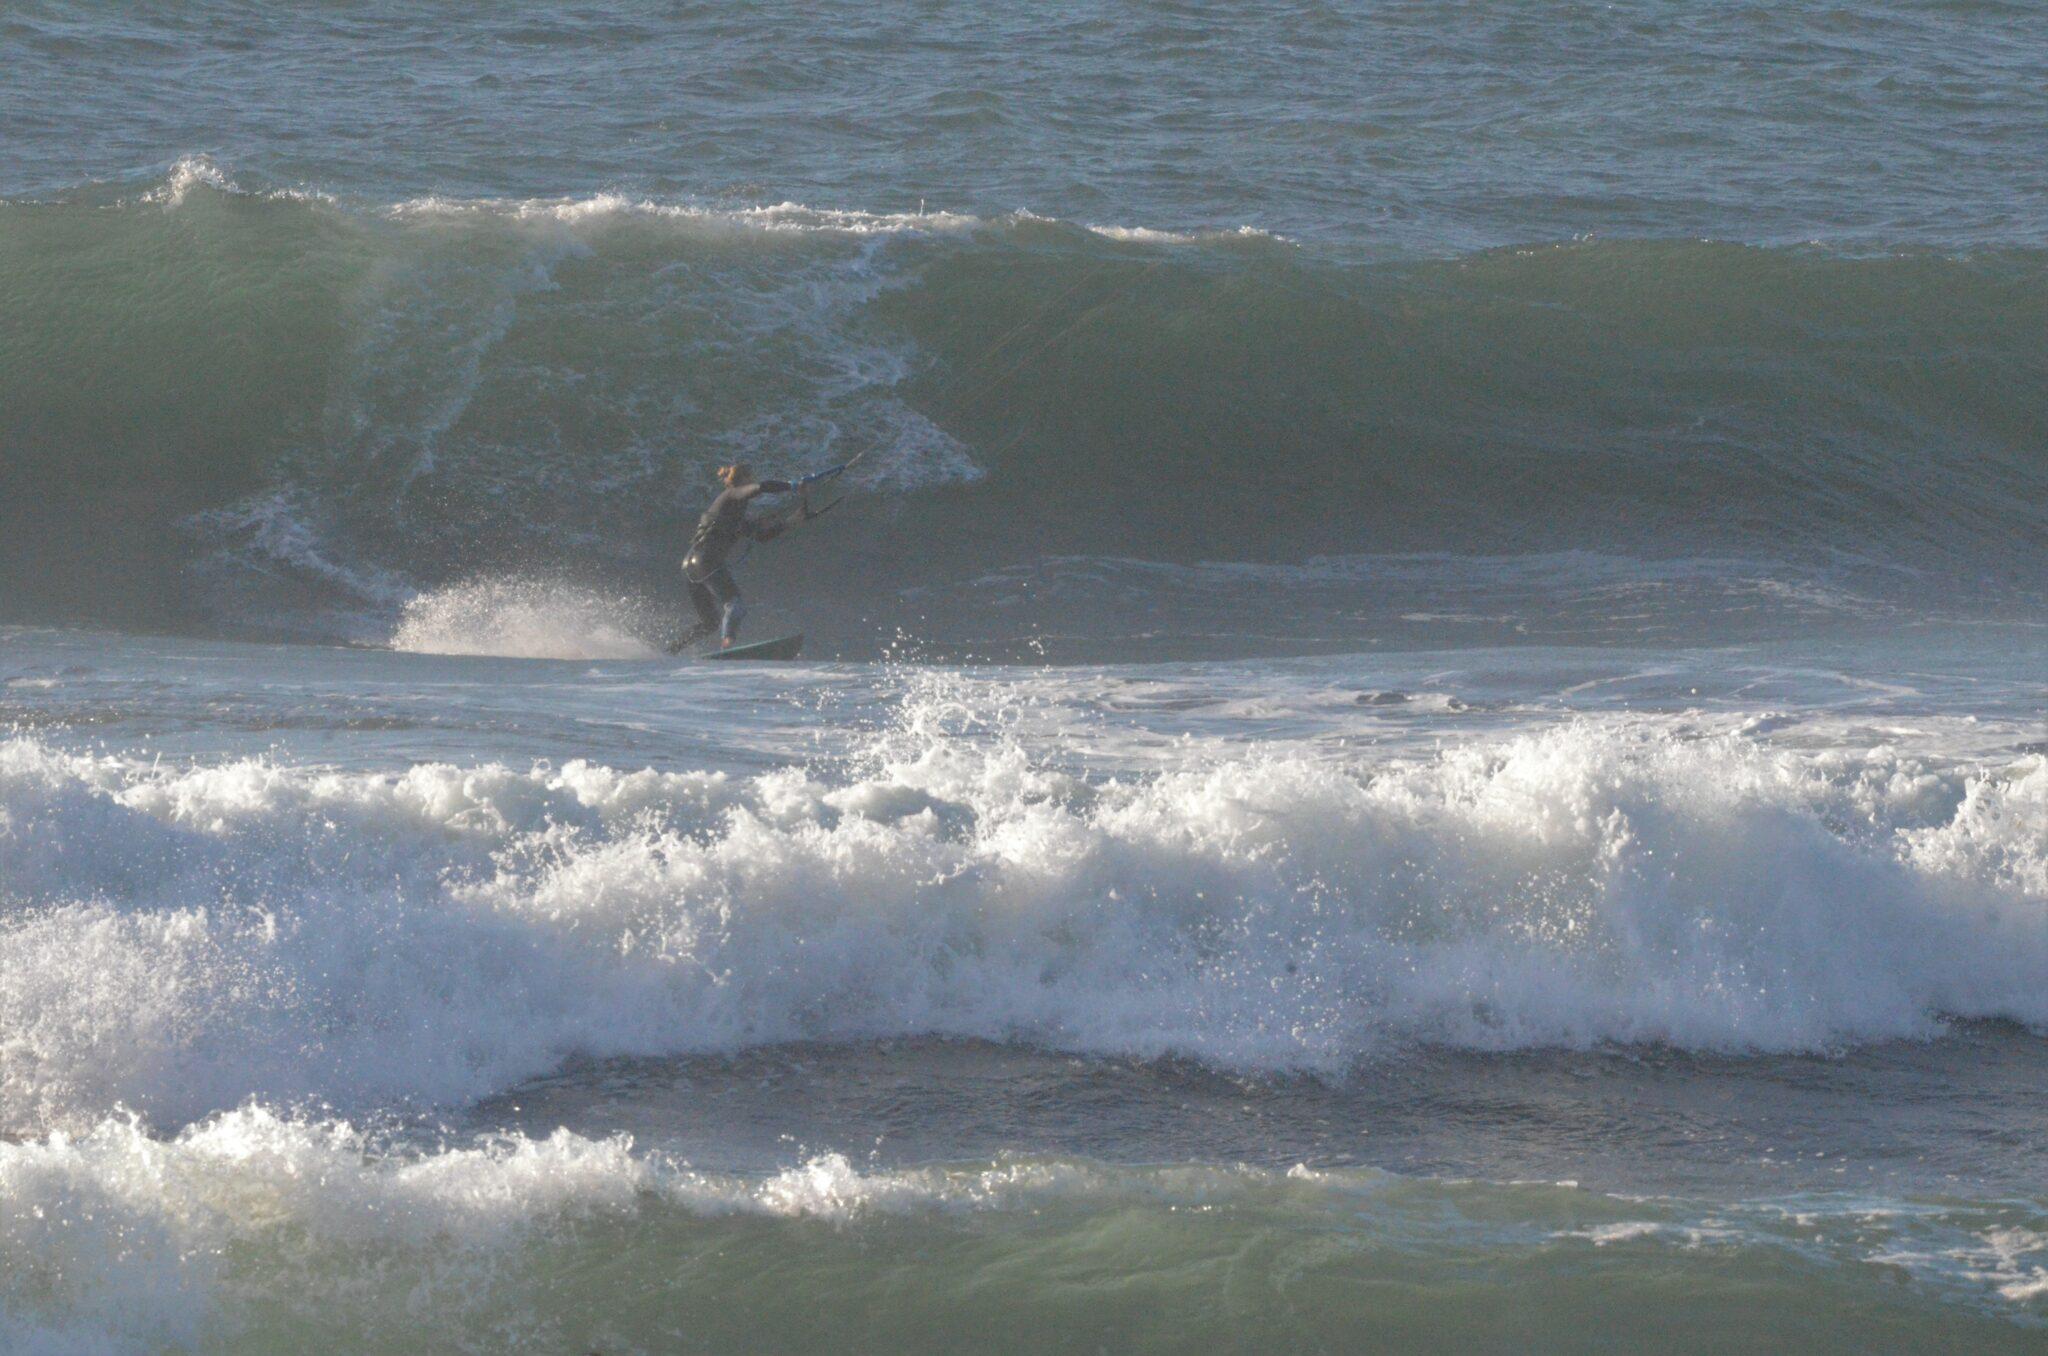 Wave kitesurfing big waves in chile